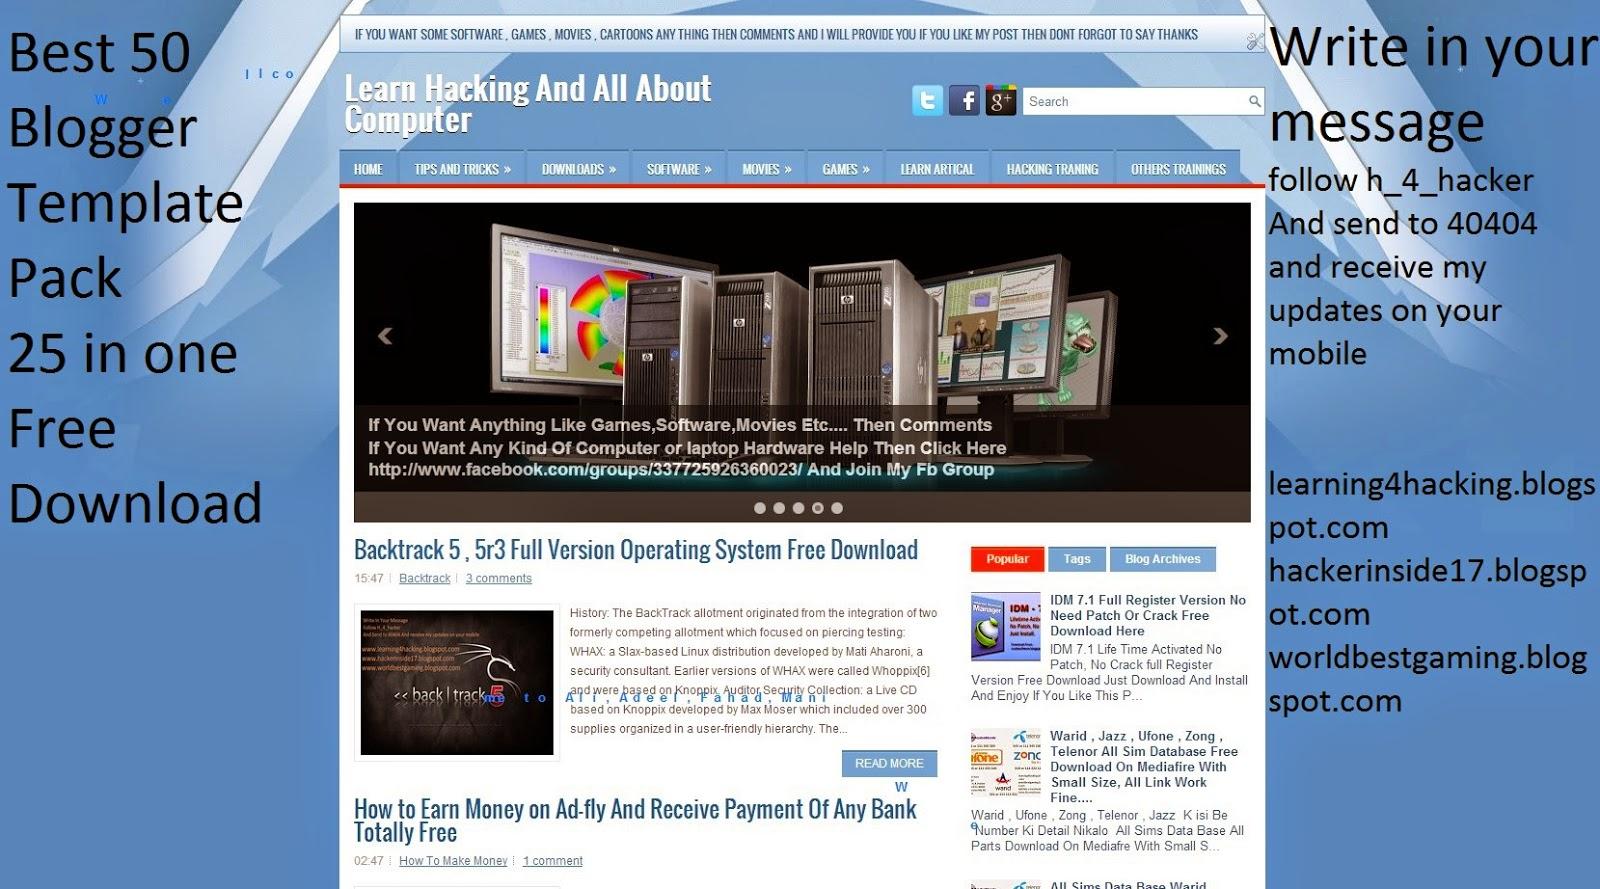 Best 25 Blogger Templates Free Download H4hacker